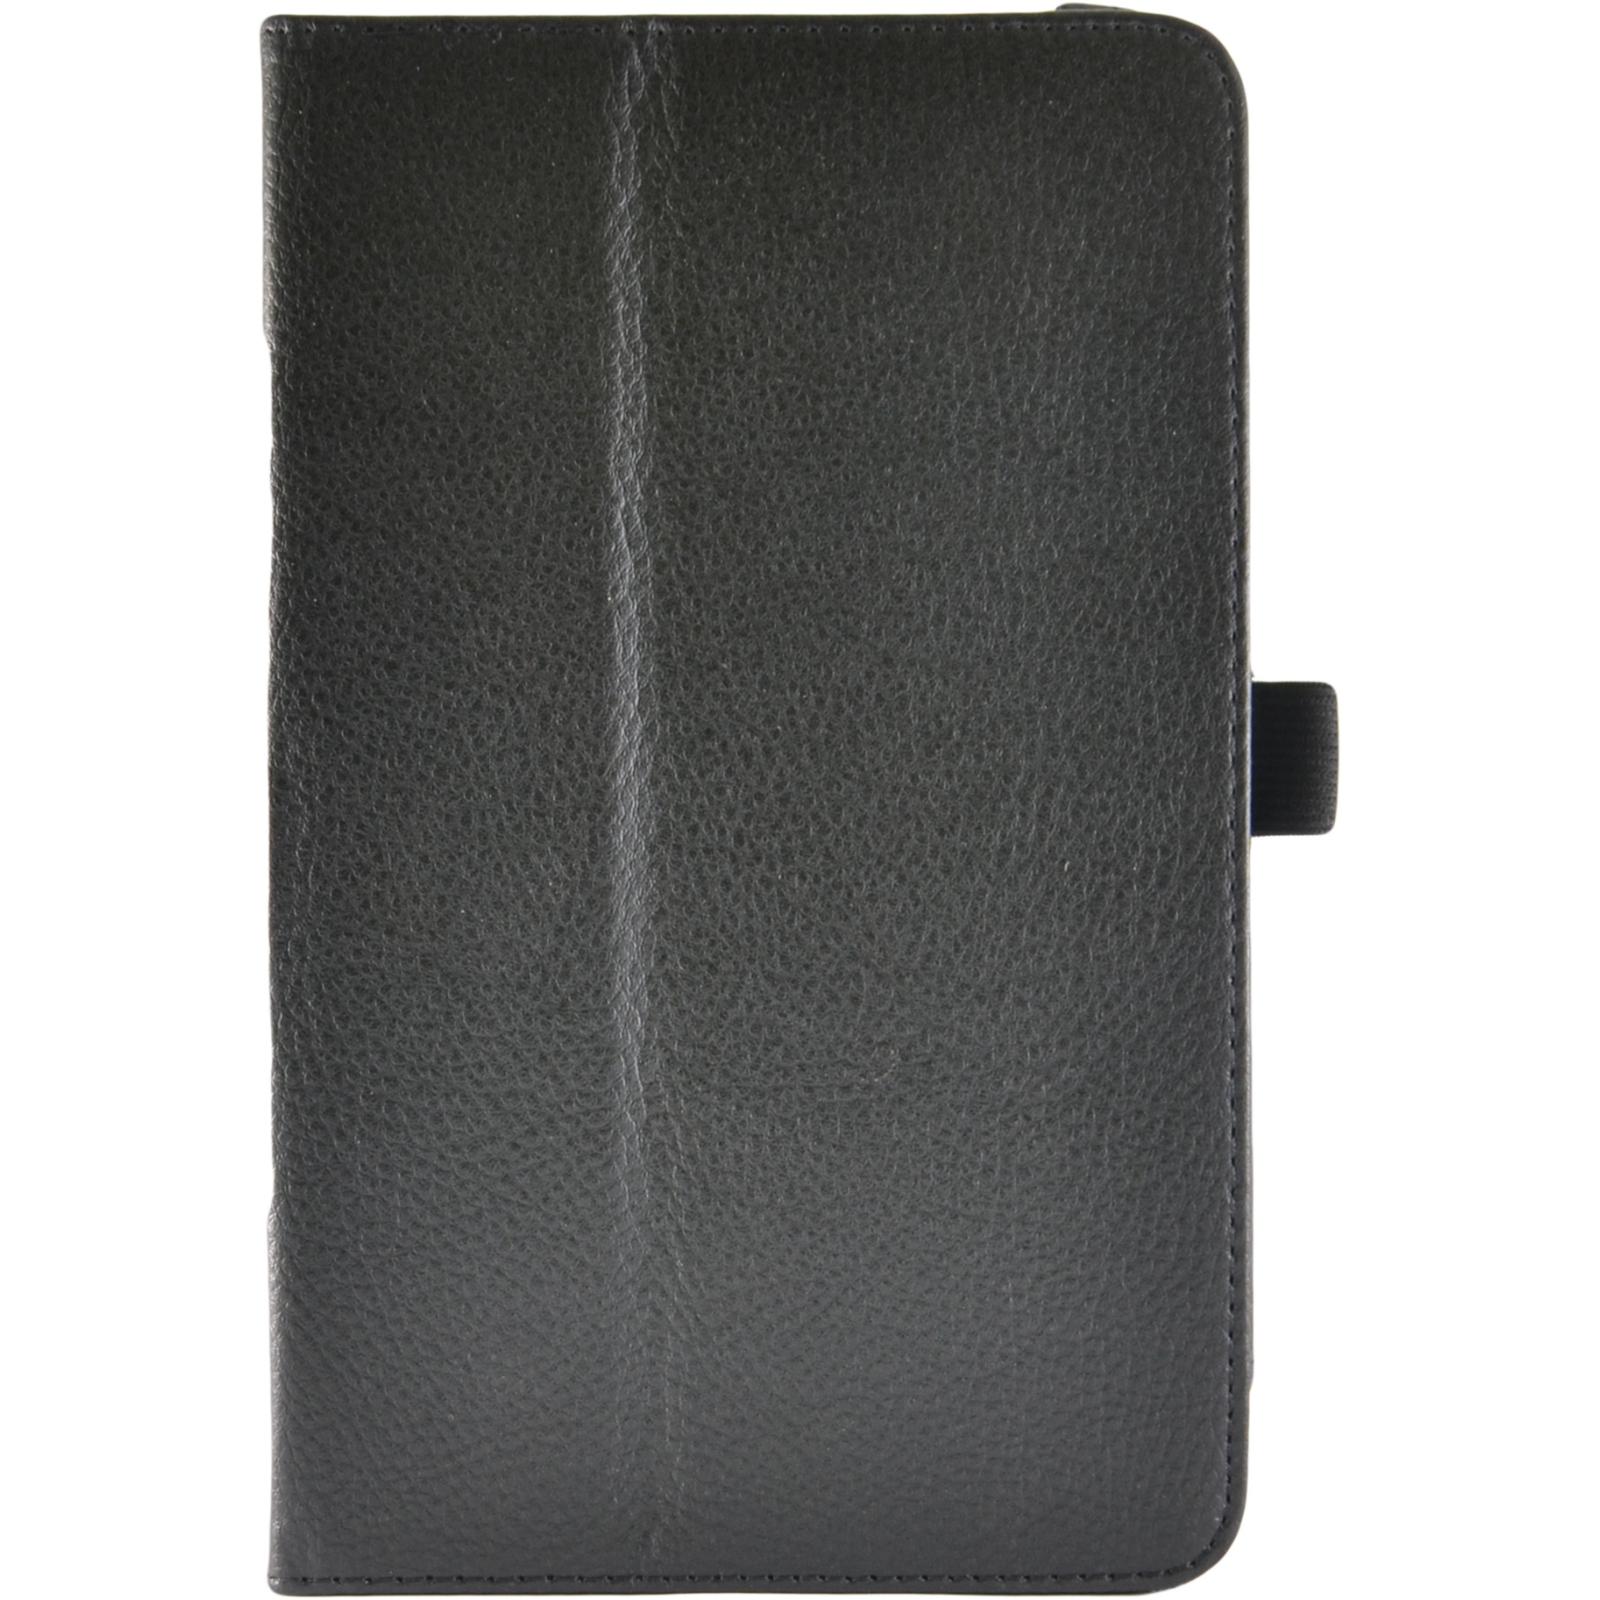 "Чехол для планшета Pro-case Asus FonePad ME373 7"" (ME373)"